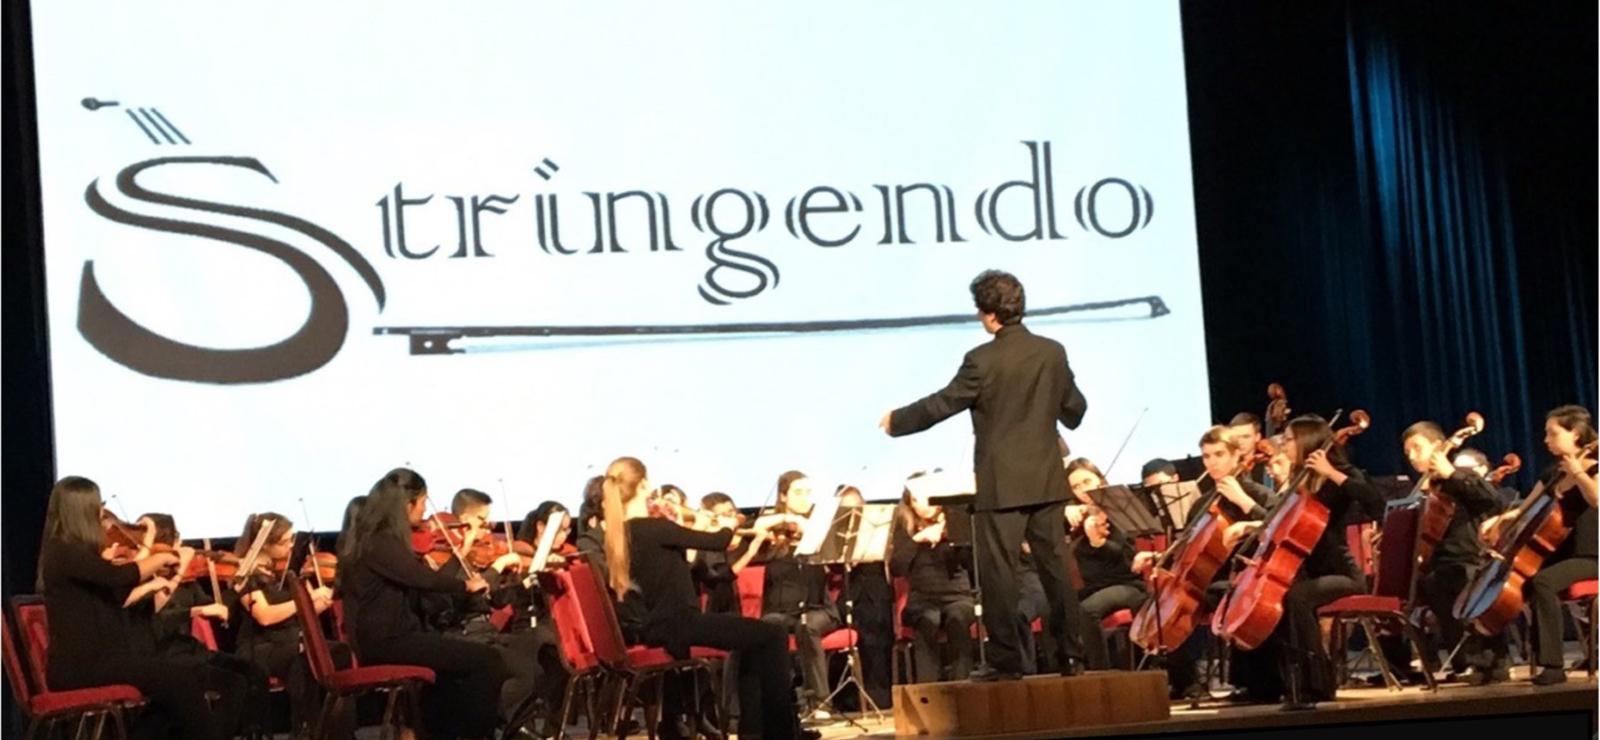 [Stringendo Annual Gala Concert]